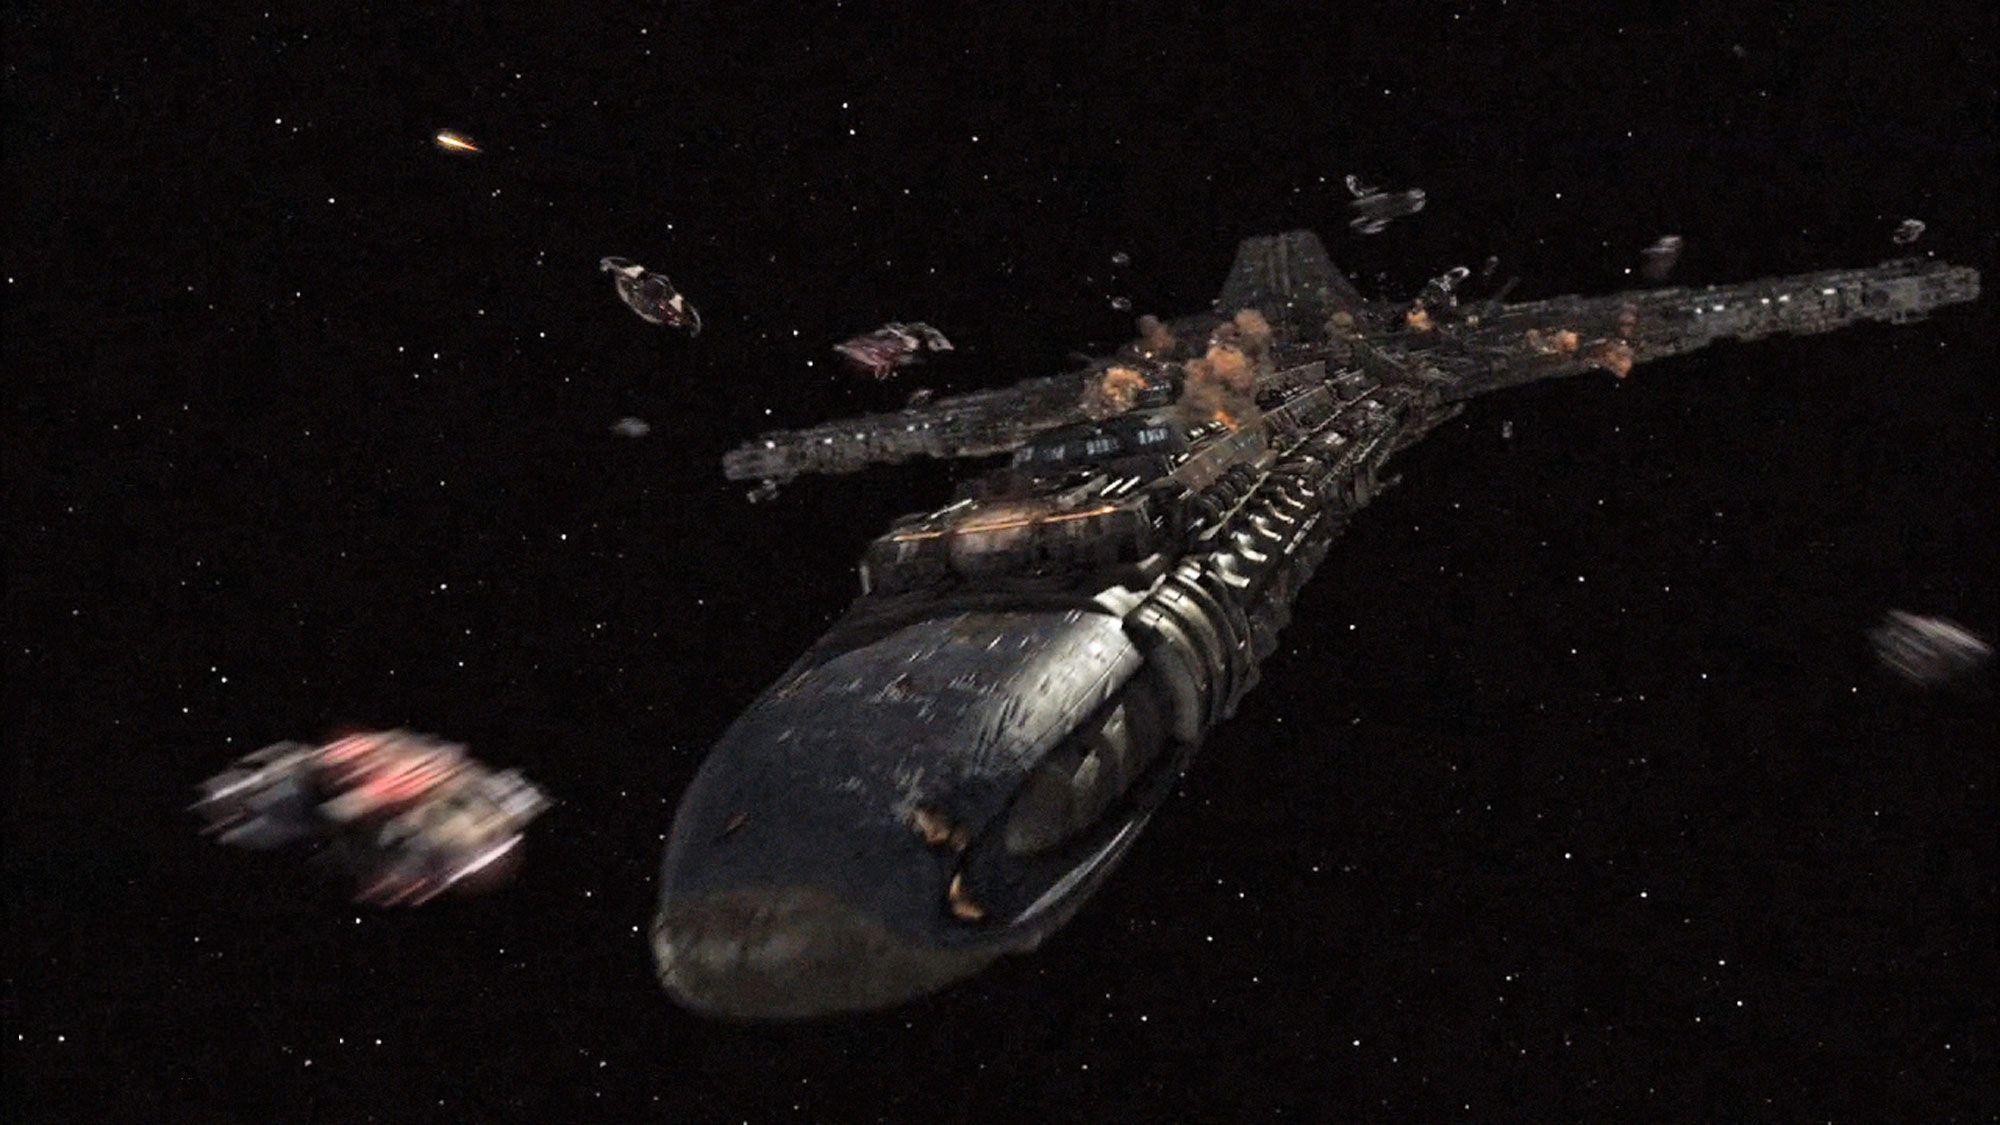 stargate wallpaper universe space - photo #35